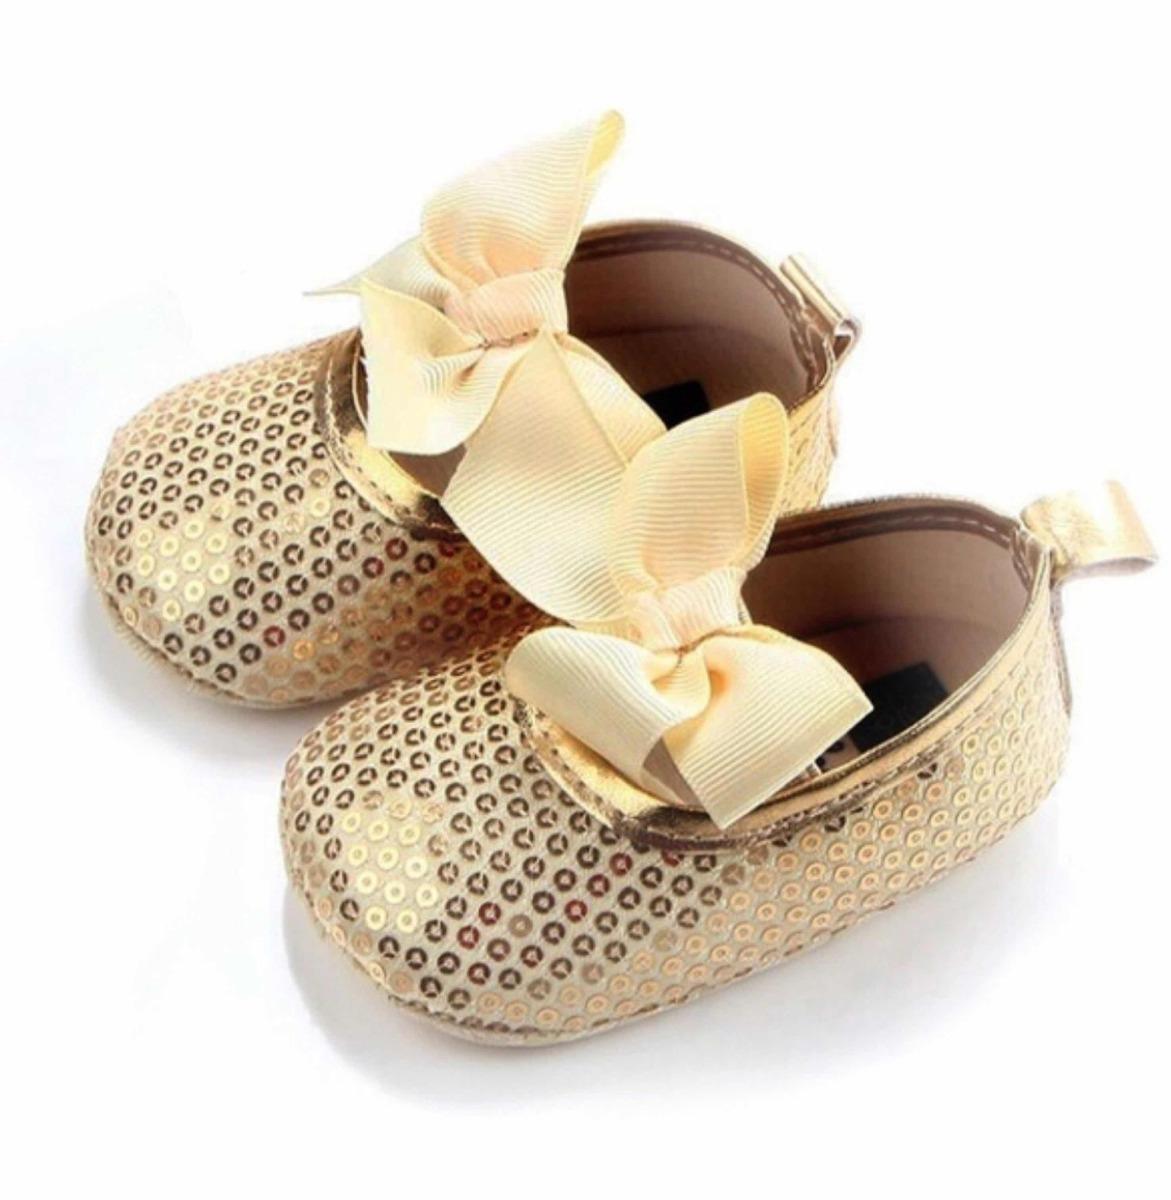 bd76af5d68a20 Zapatos Balerinas Para Bebé. Dorados (12 Cm.) -   149.00 en Mercado ...